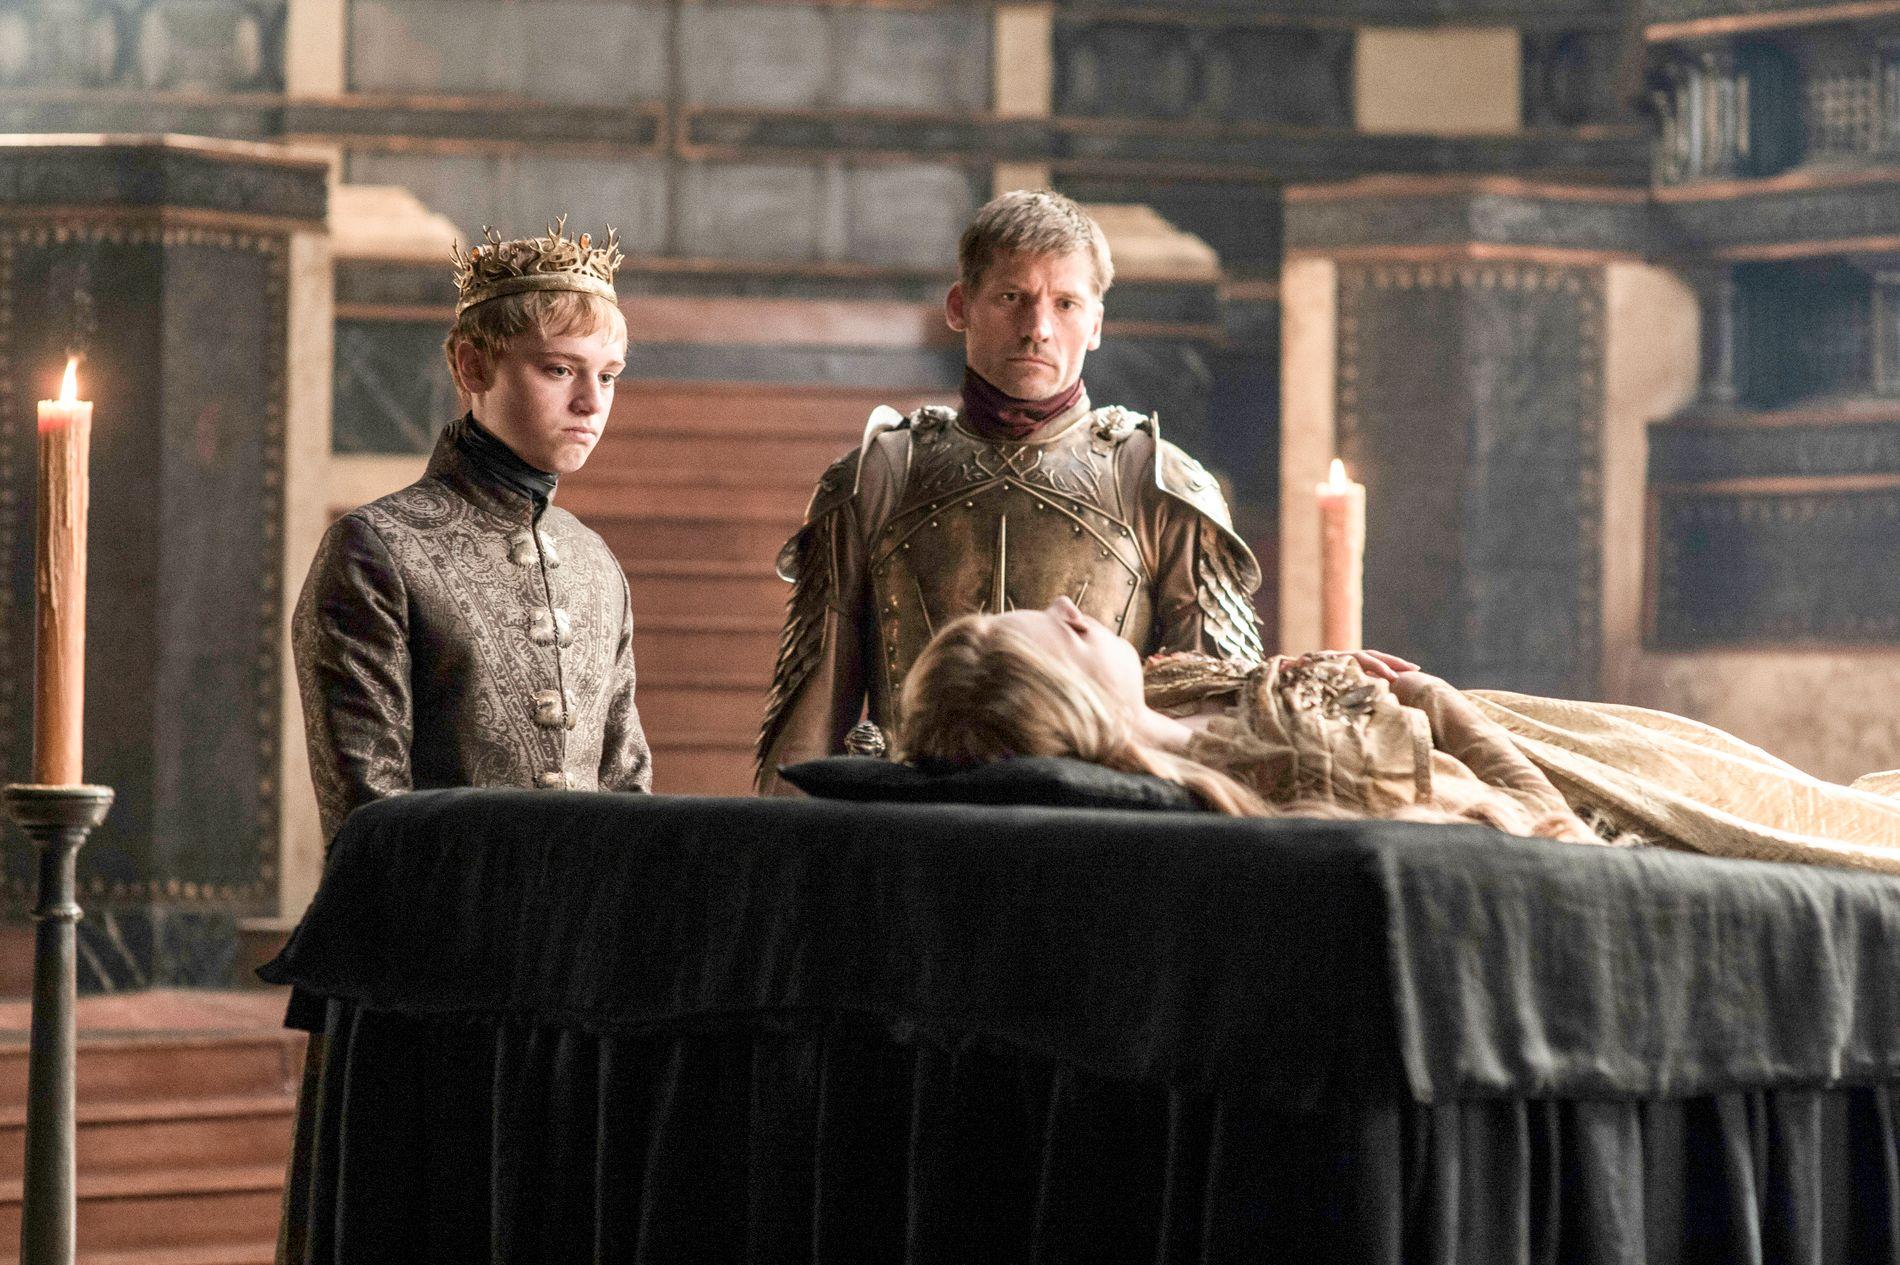 DØDE I SESONG FEM: Myrcella Baratheon overlevde ikke lenger enn sesong fem. Denne scenen er fra sesong seks, hvor broren Tommen Baratheon (Dean-Charles Chapman) og Jaime Lannister (Nikolaj Coster-Waldau) sørger over hennes død.